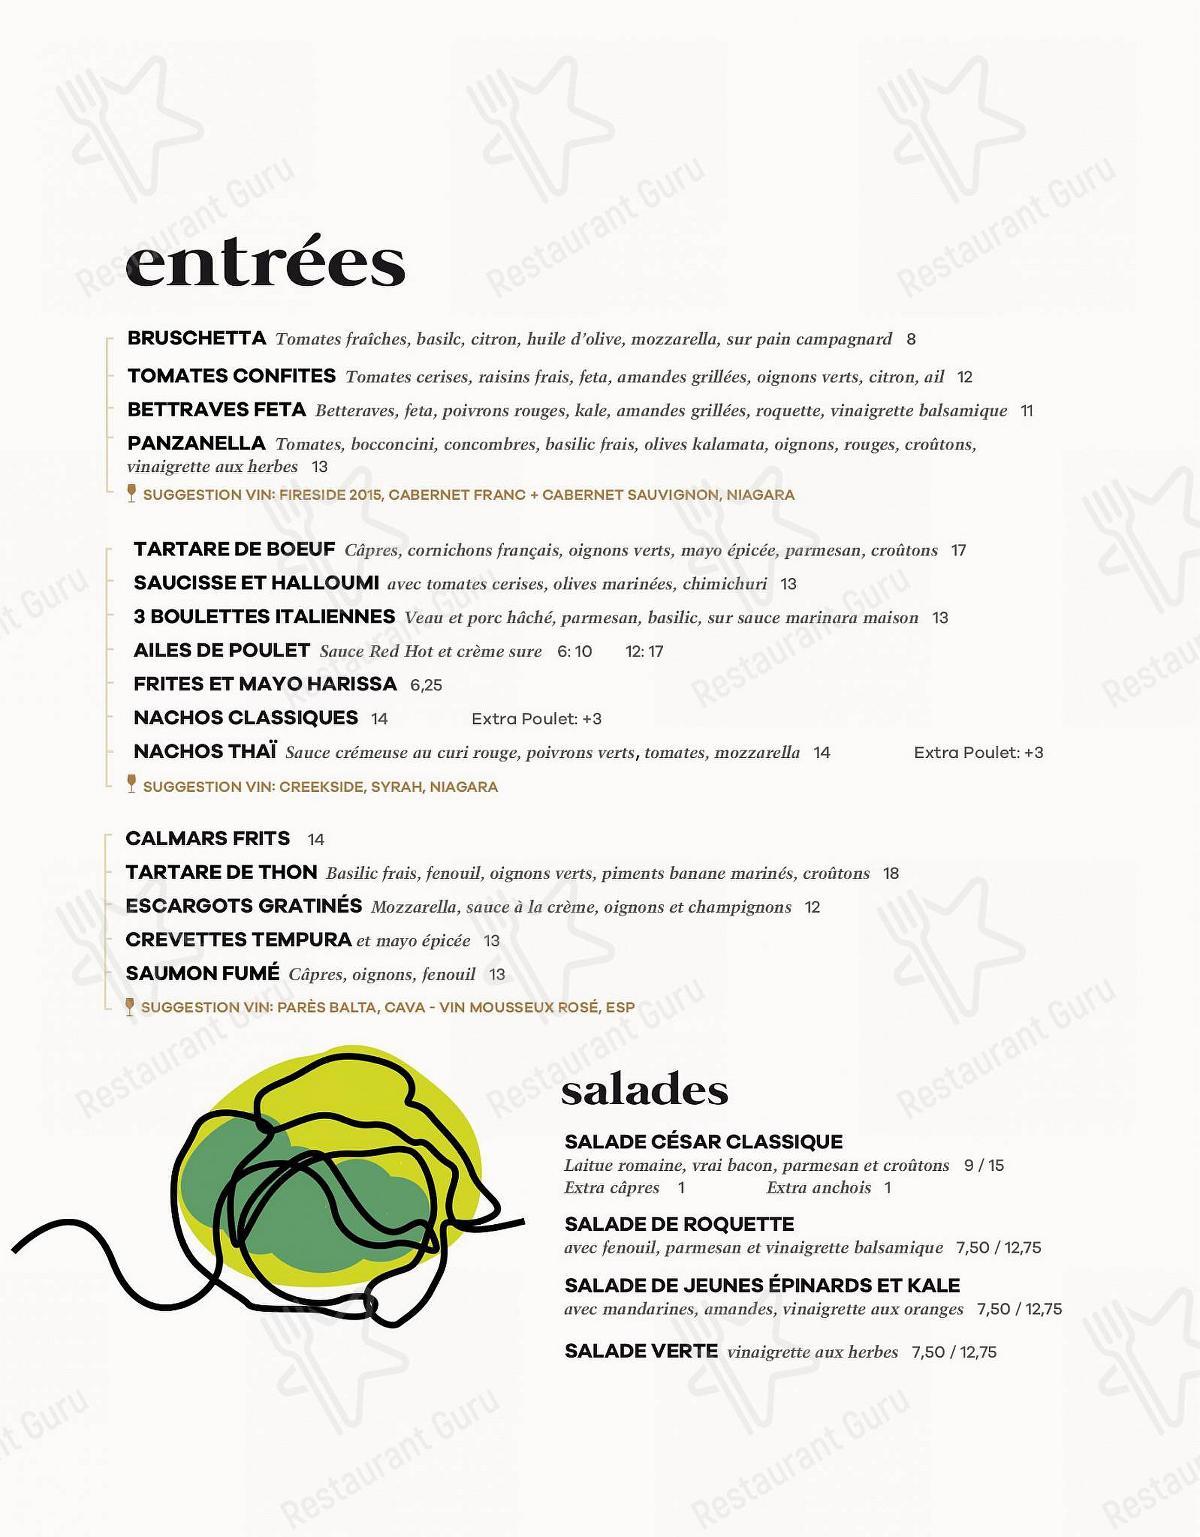 Check out the menu for Pizzé